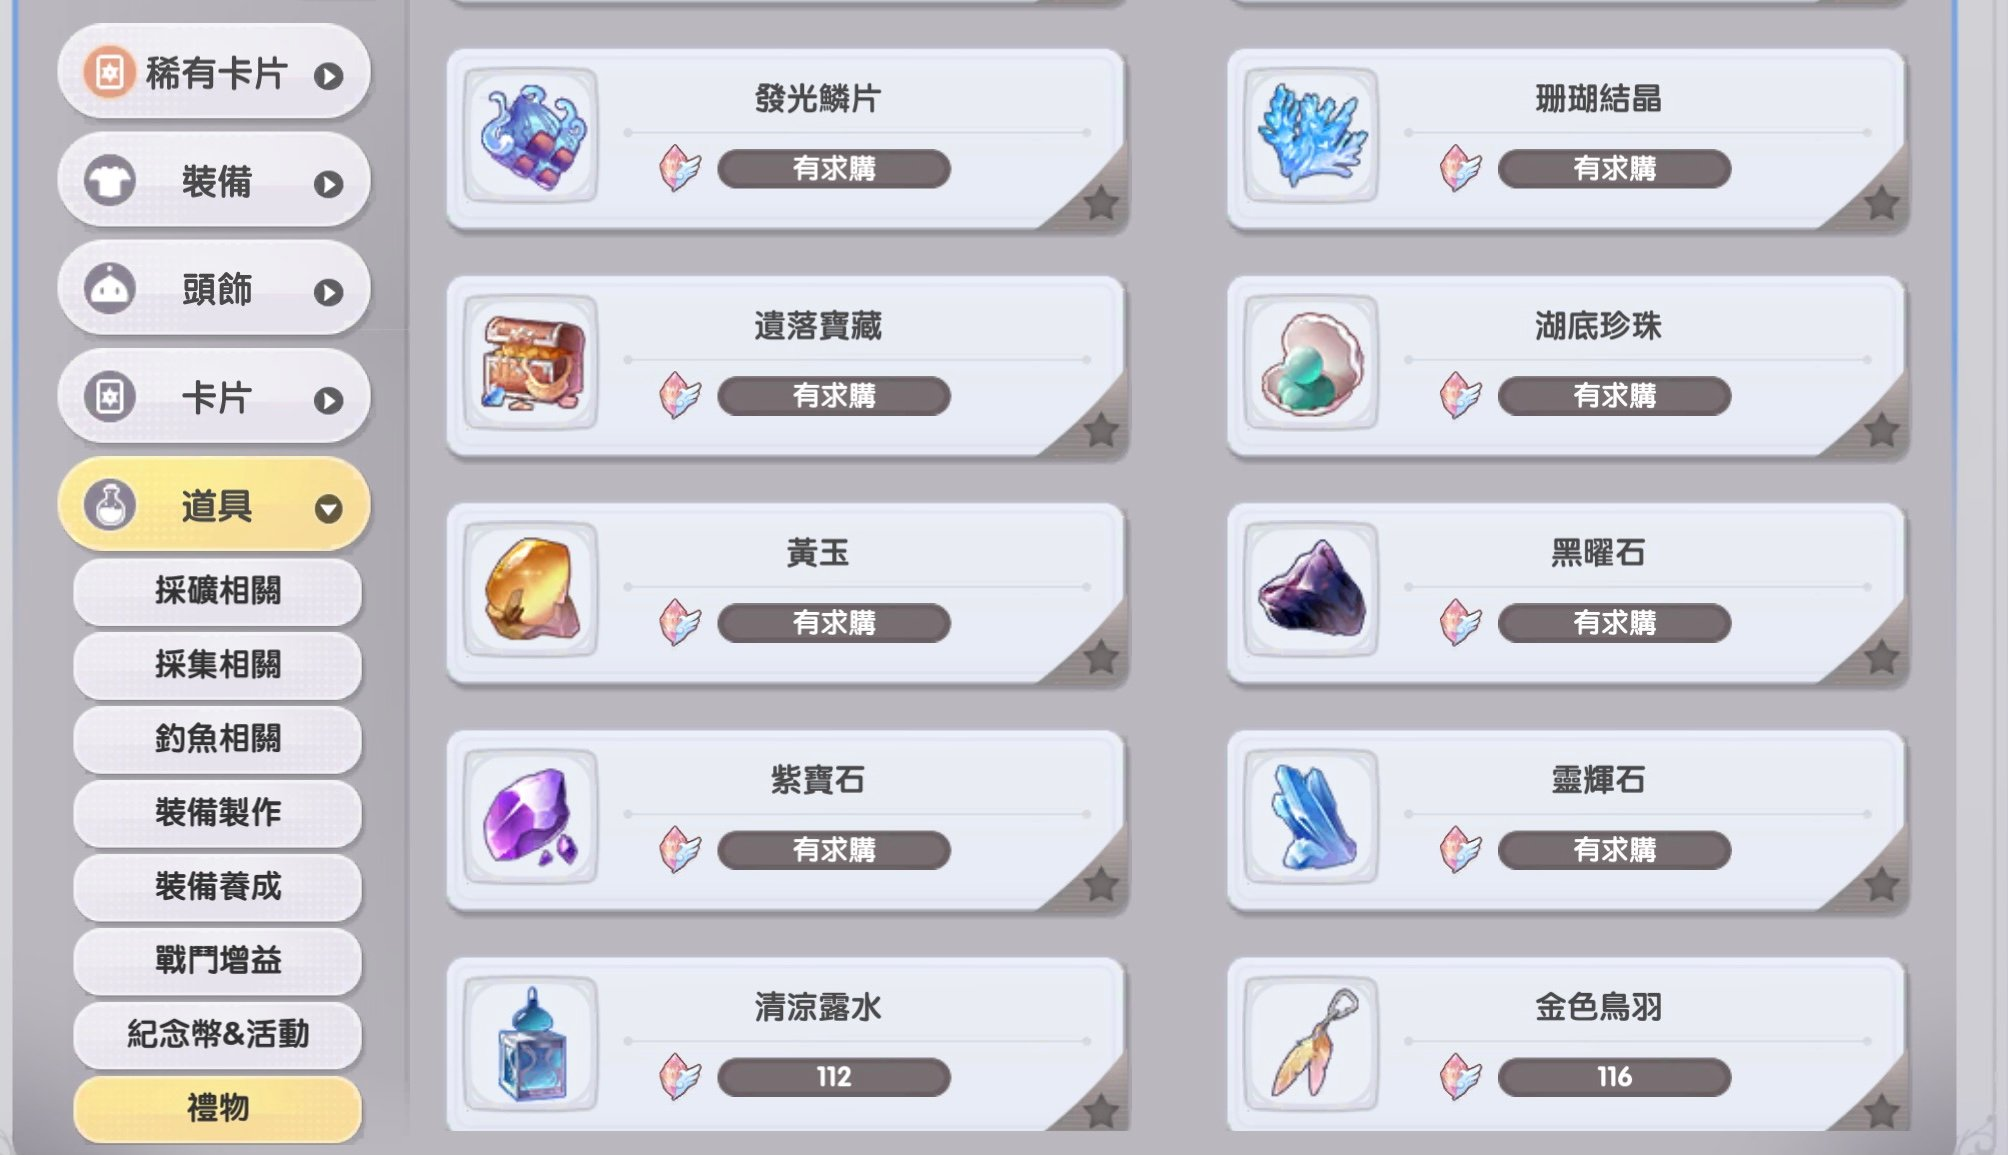 RO NPC 好感度 物品 攻略 交易行 禮物 仙境傳說 新世代 石頭